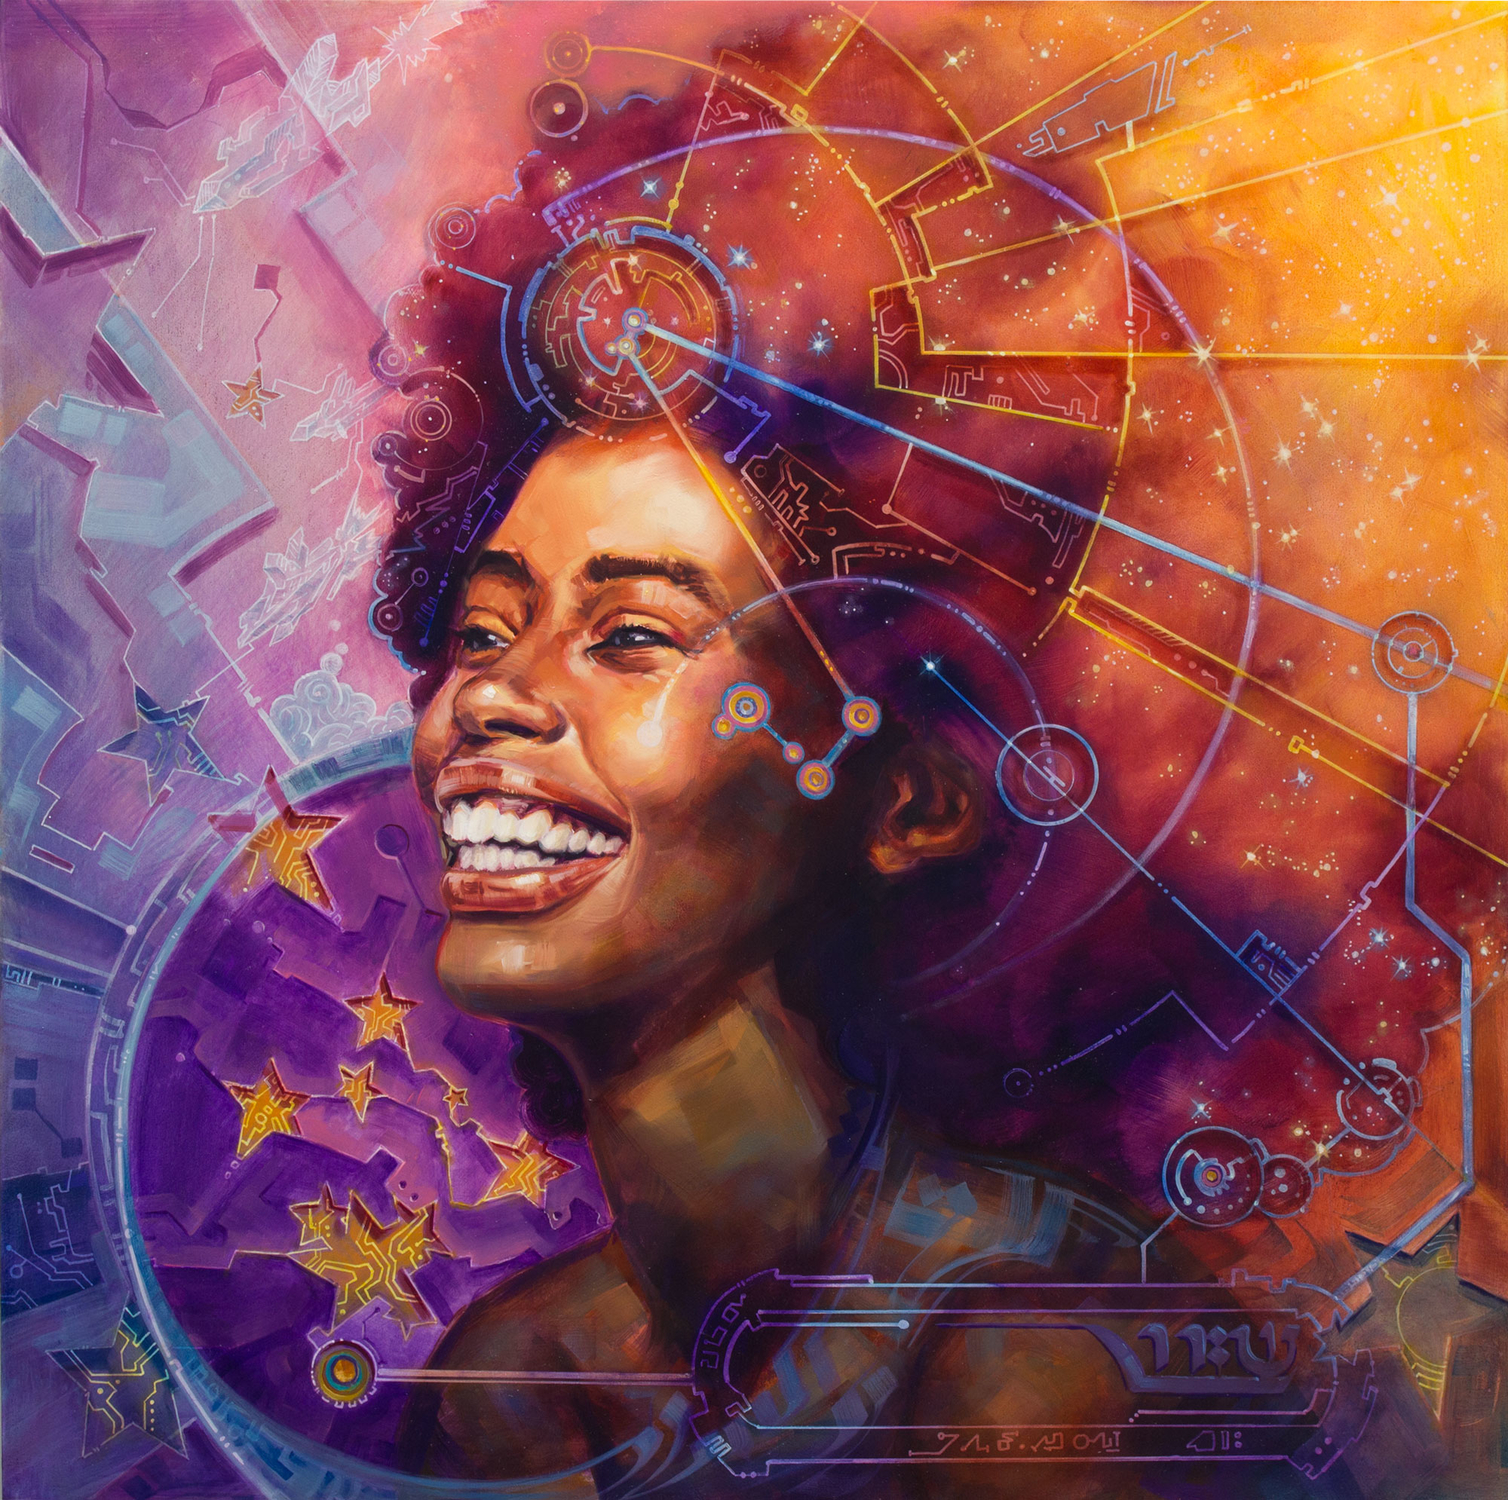 Queen of Heaven (Nebula) Artwork by Dan Cohen